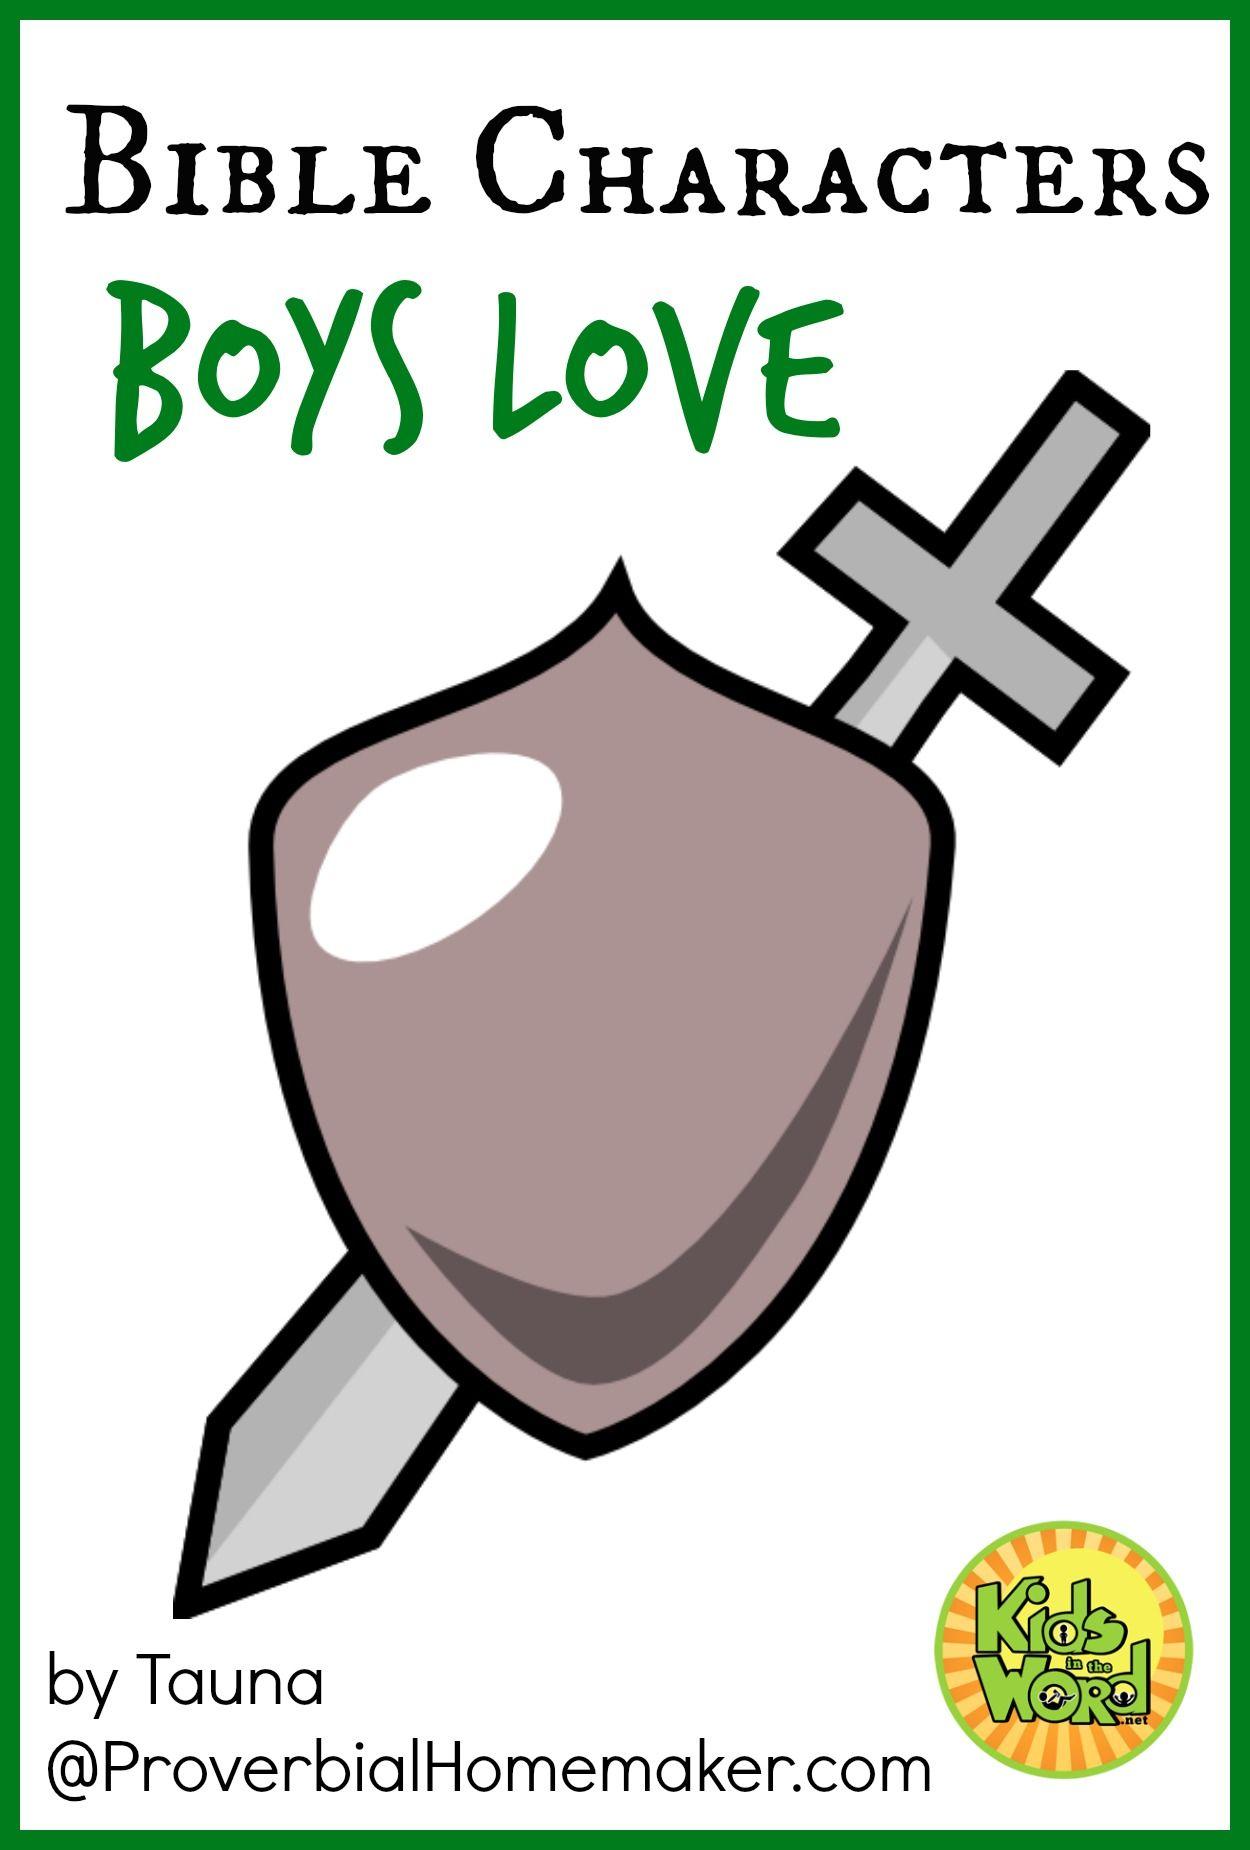 Bible Characters Boys Love